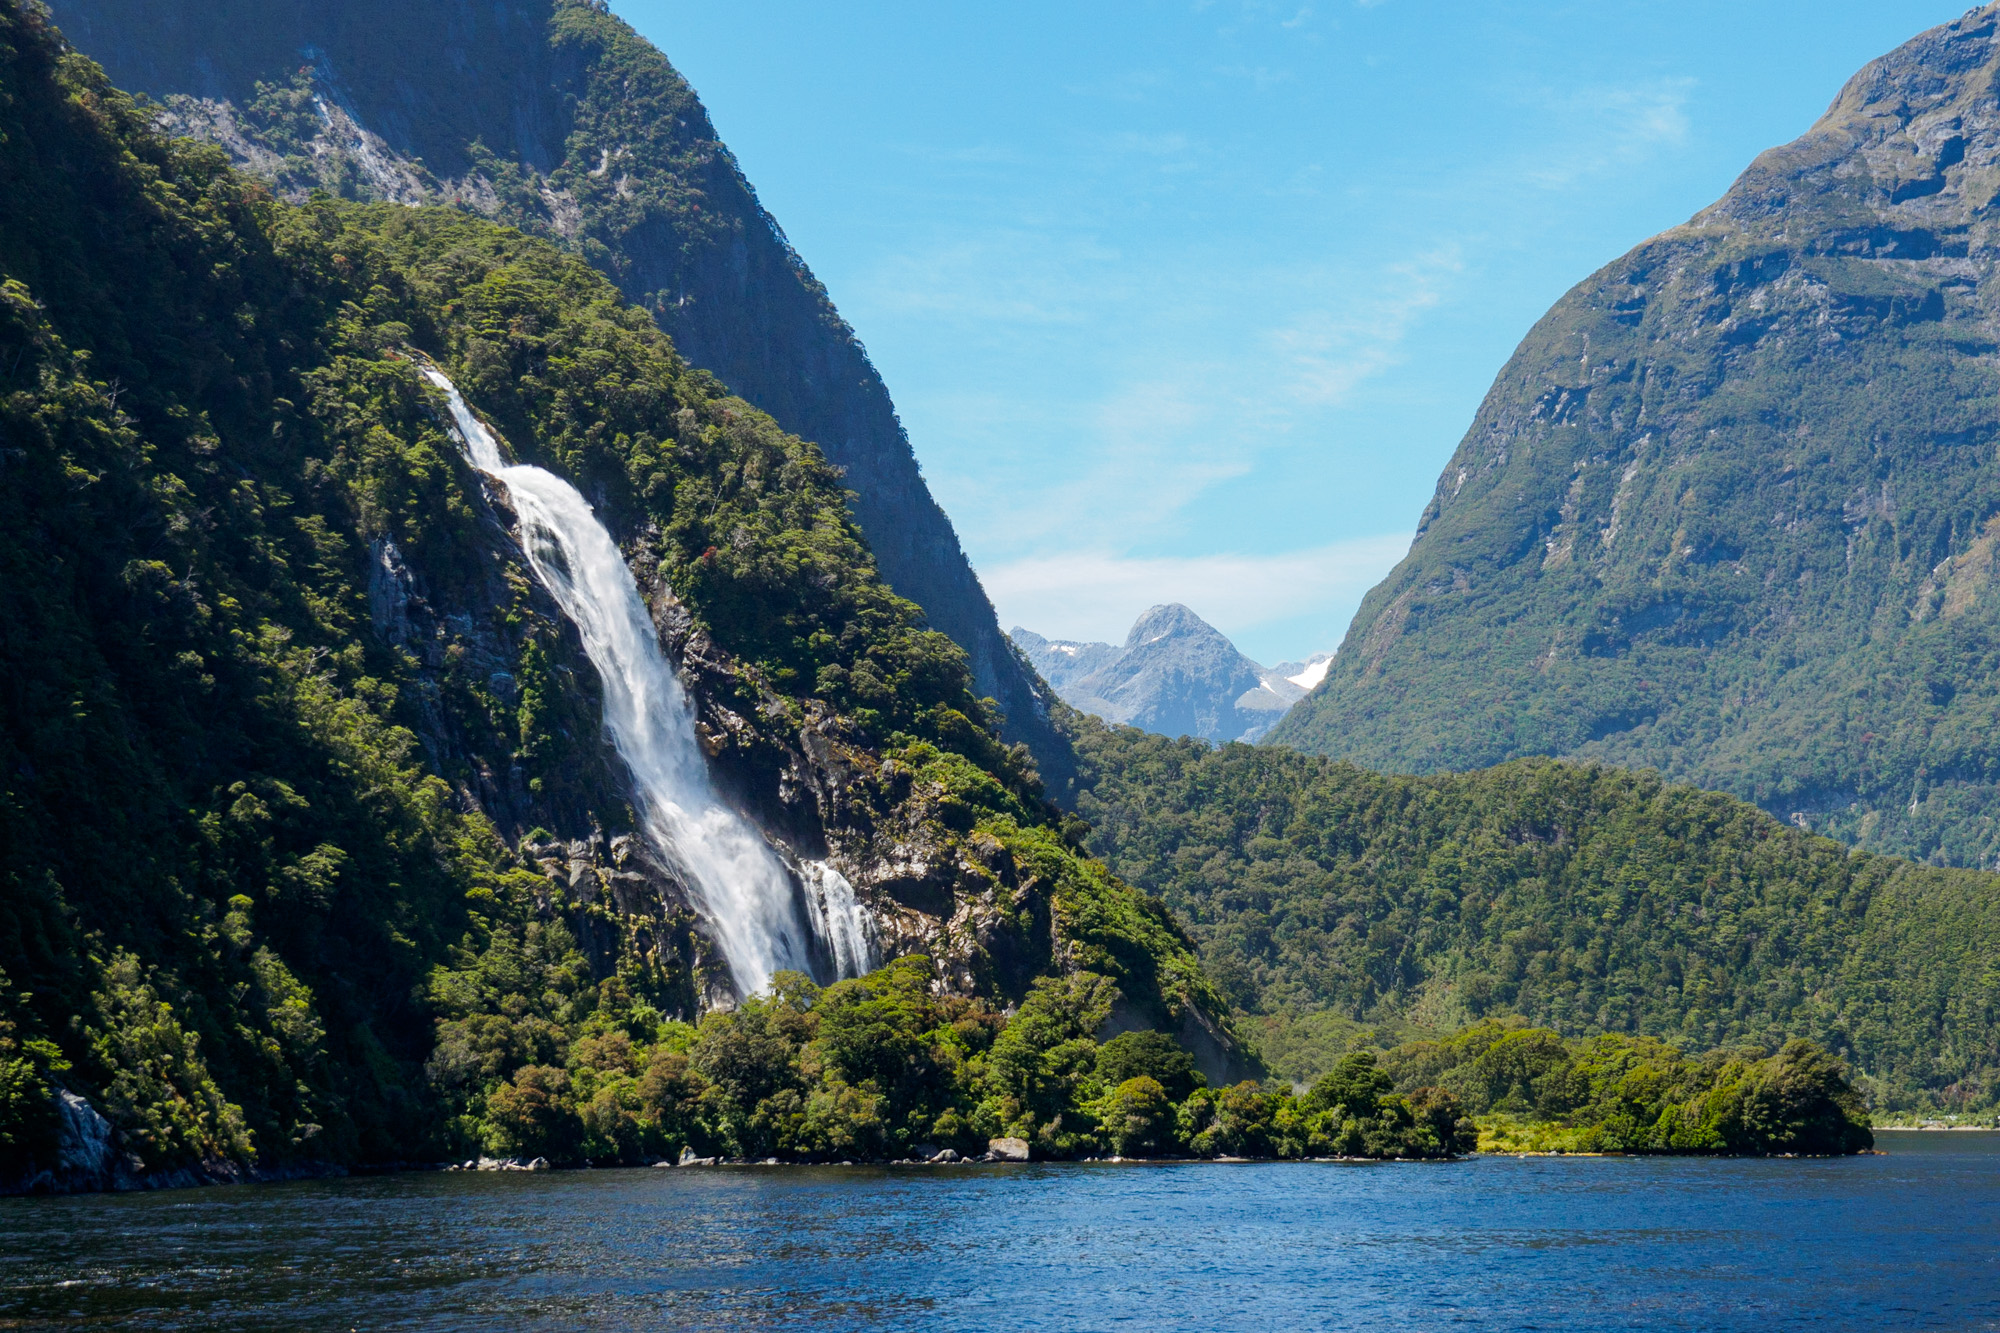 Milford Sound - Bowen Fall